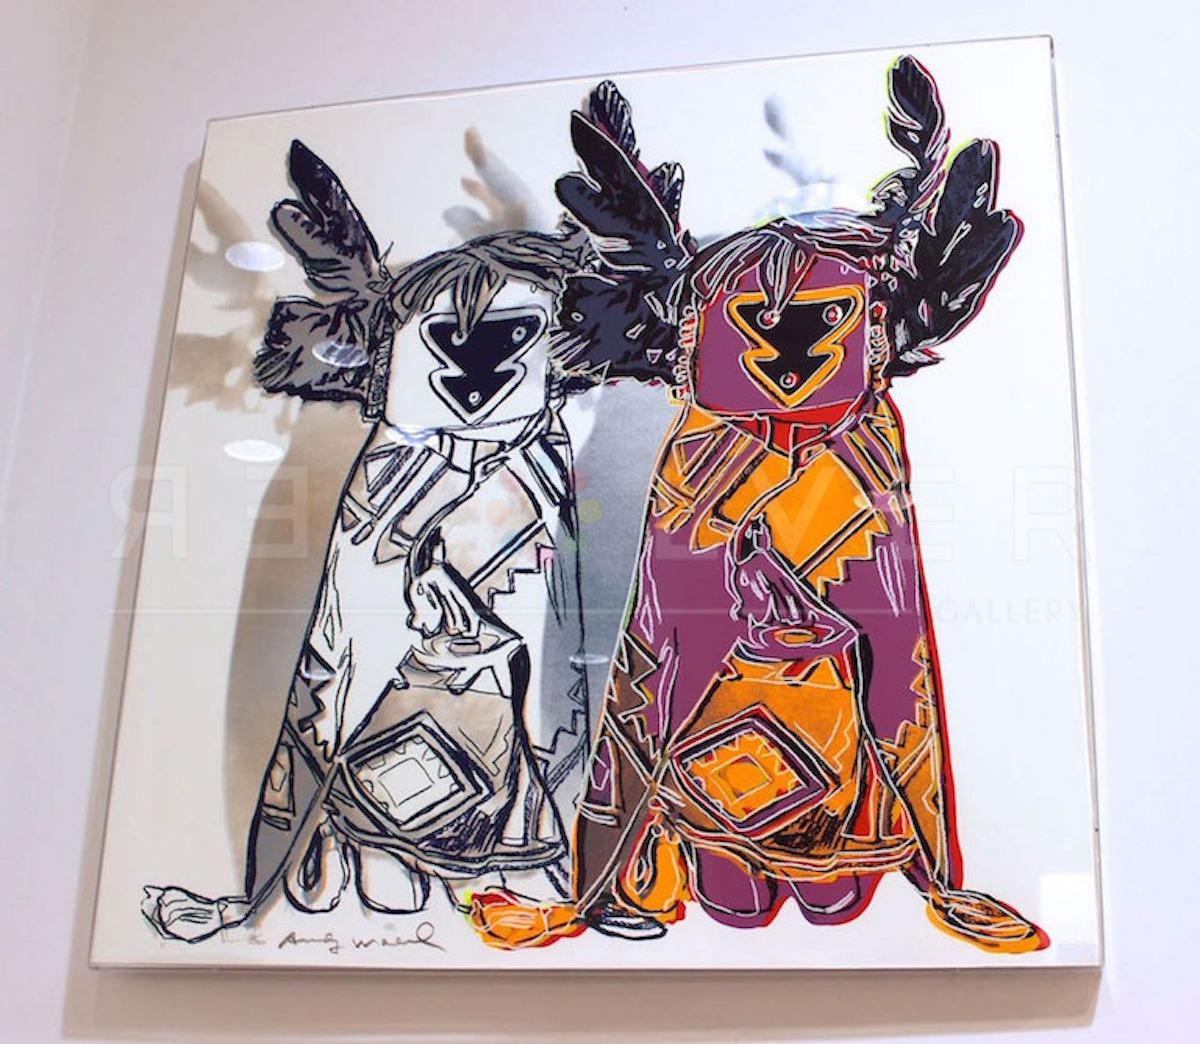 Andy Warhol - Kachina Dolls F.S. II 381 framed jpg